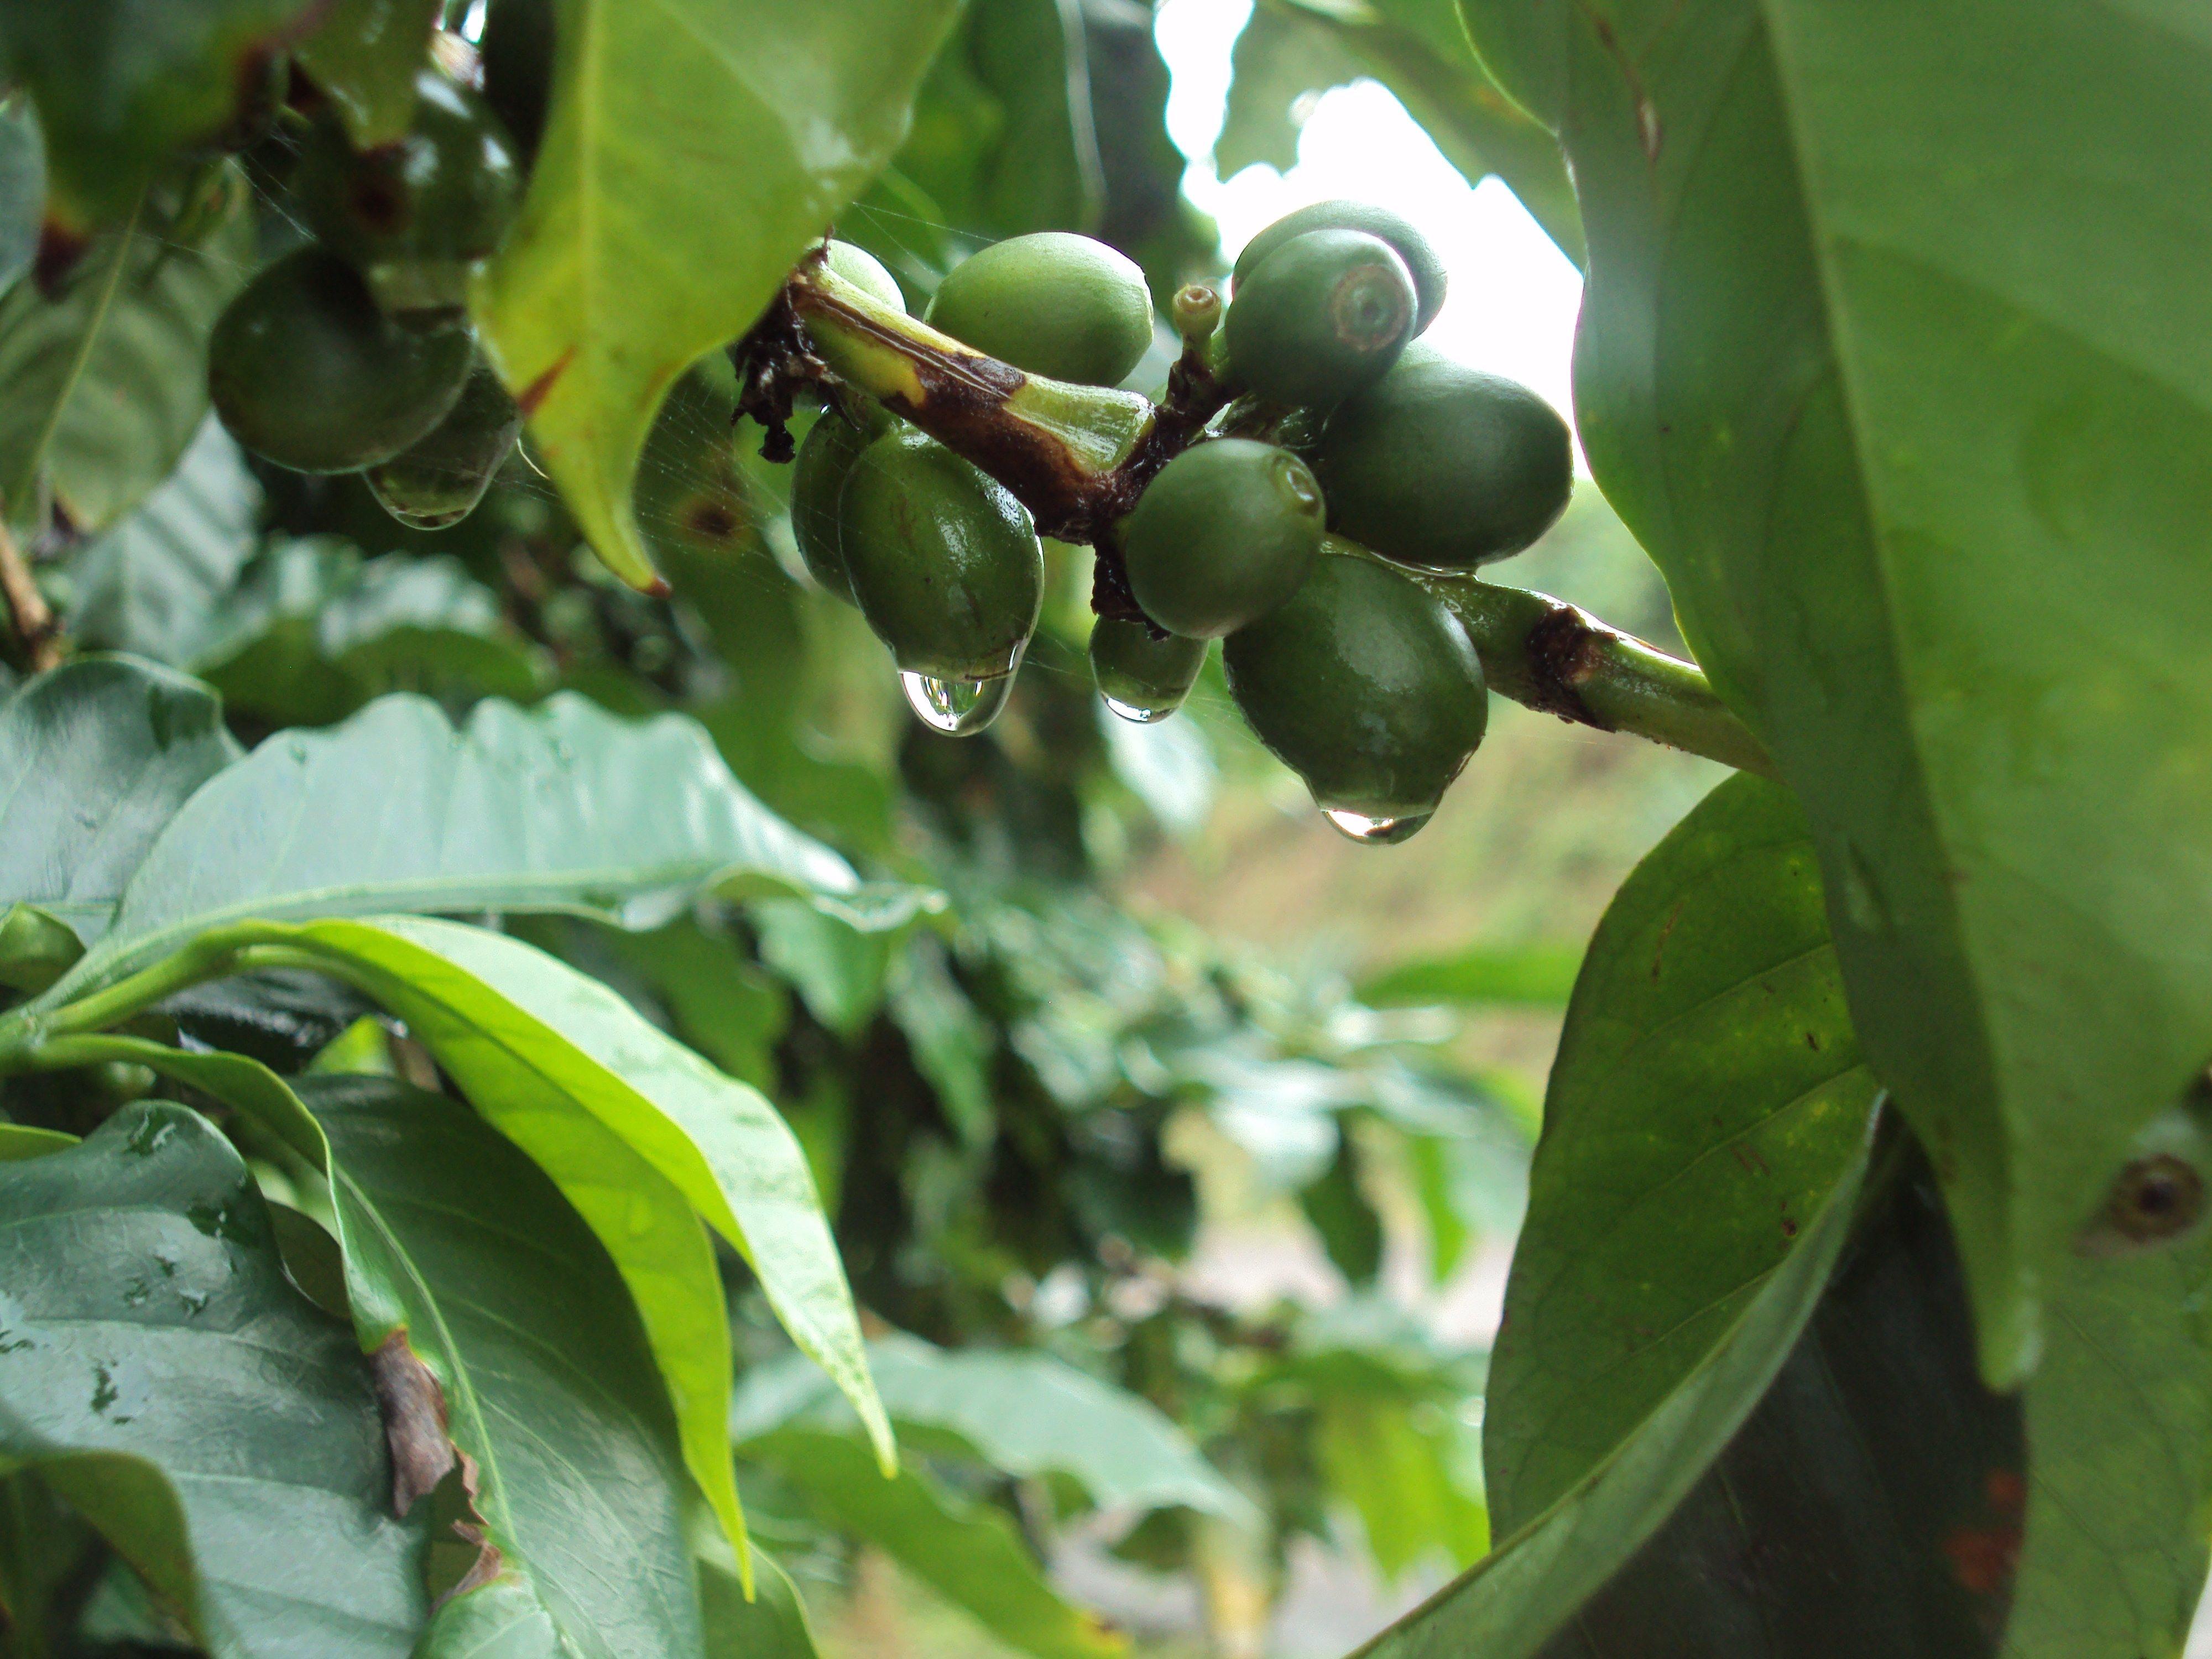 Classic Costa Rican green coffee berries.